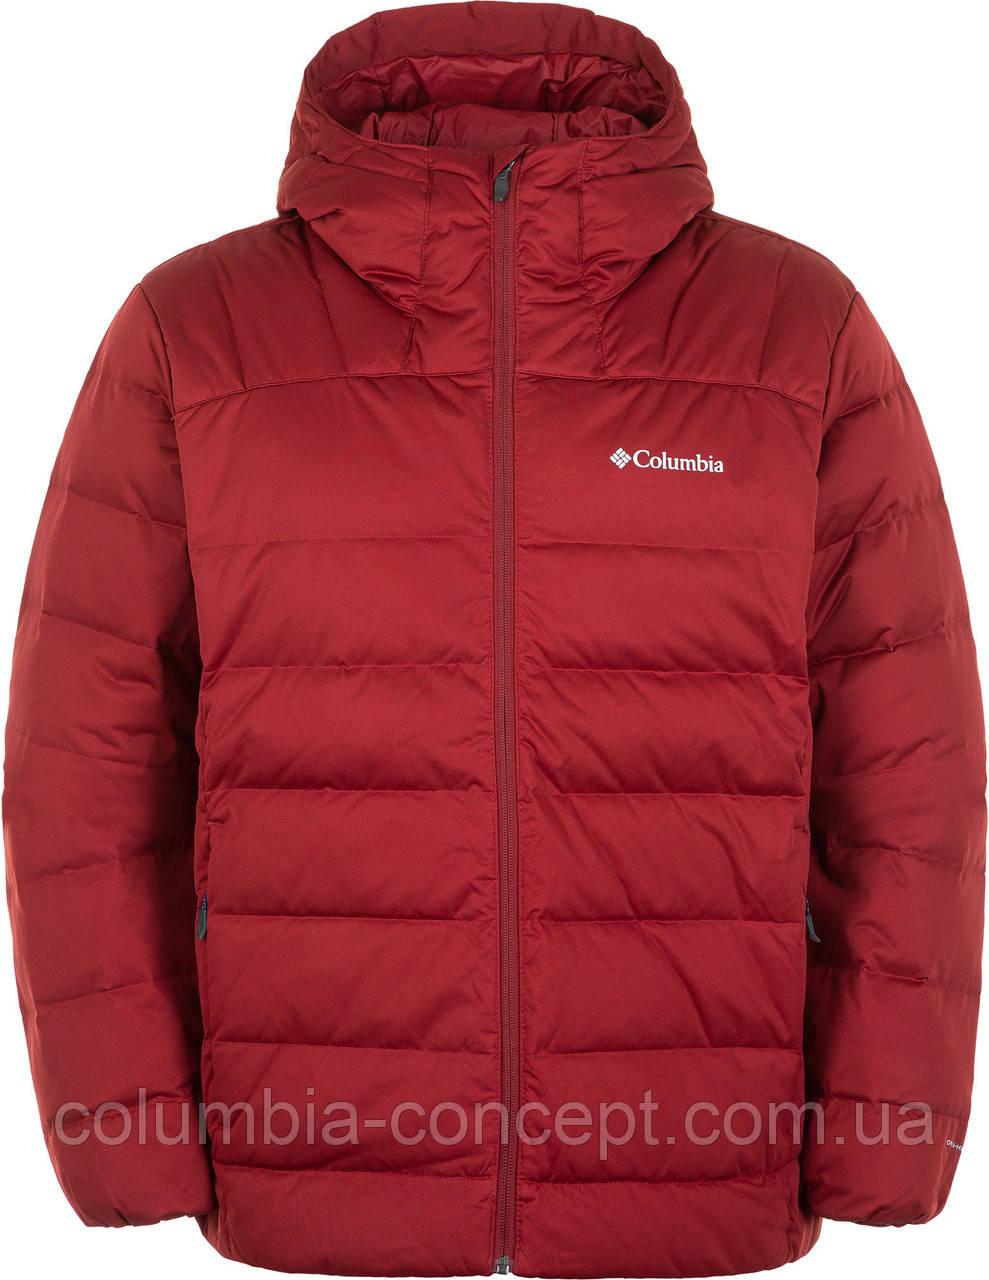 Куртка пуховая мужская Columbia Wrightson Peak II Down